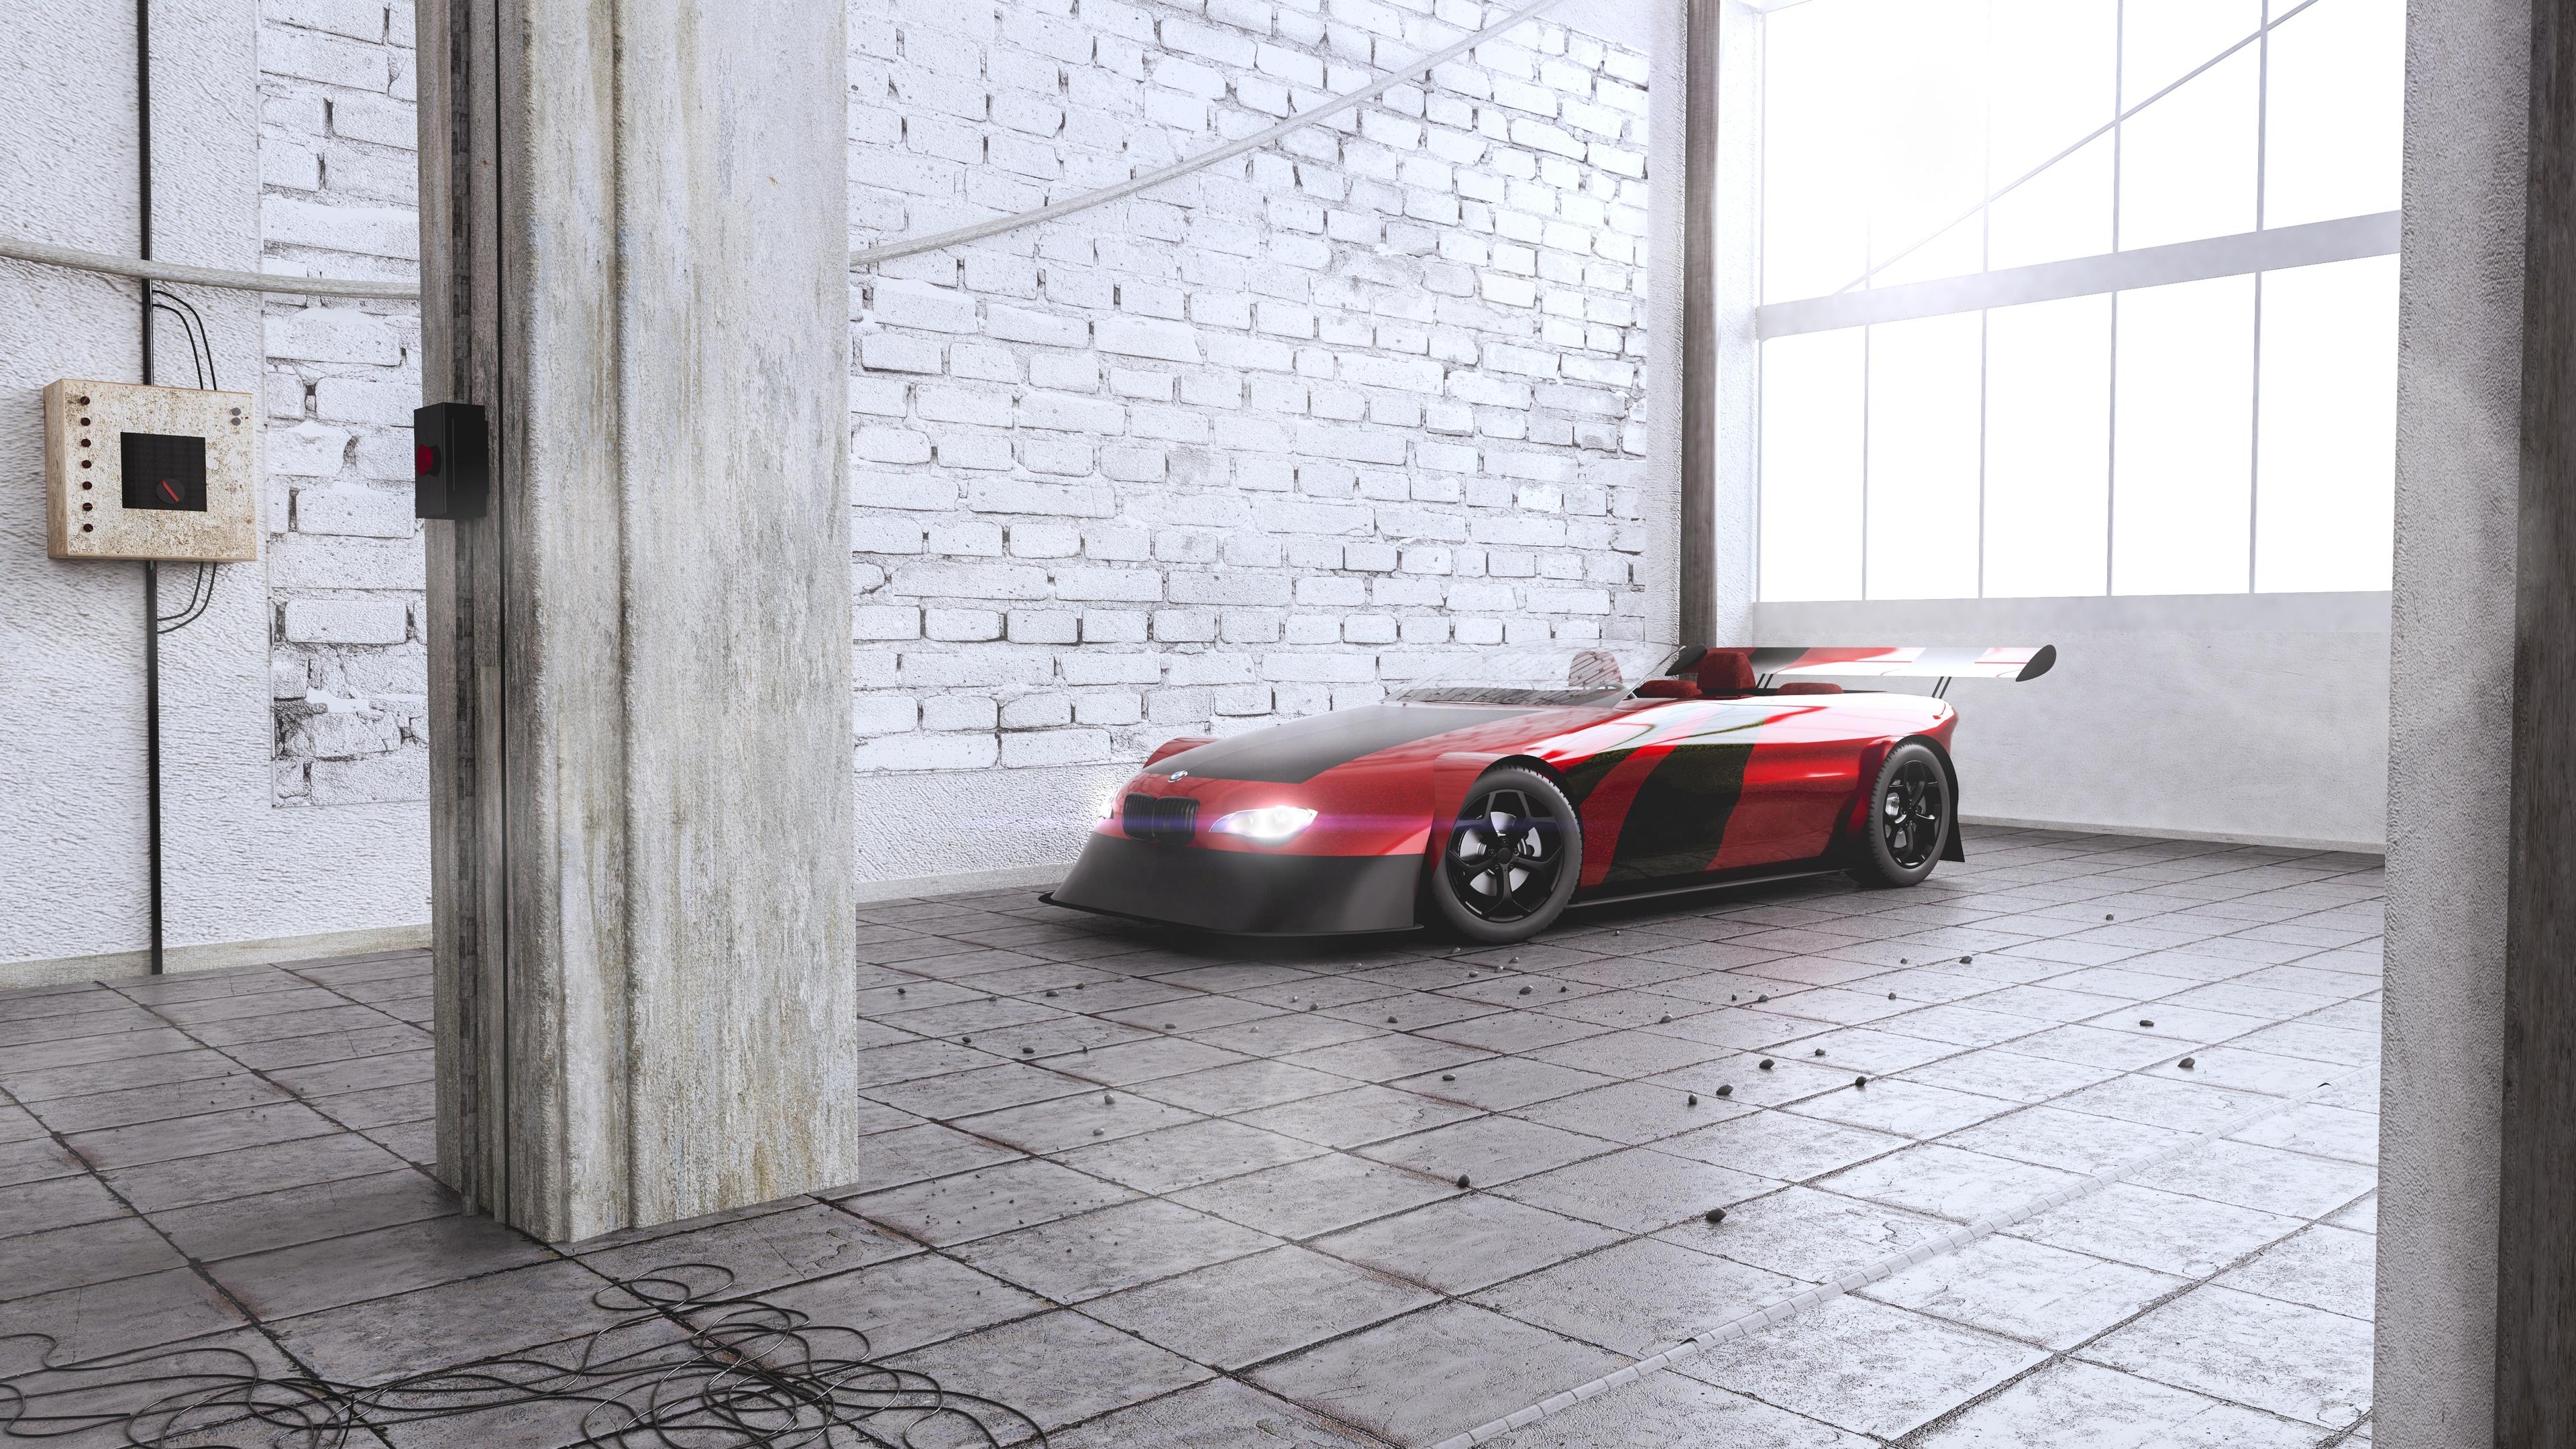 bmw concept car 1539110571 - Bmw Concept Car - hd-wallpapers, concept cars wallpapers, bmw wallpapers, artist wallpapers, 5k wallpapers, 4k-wallpapers